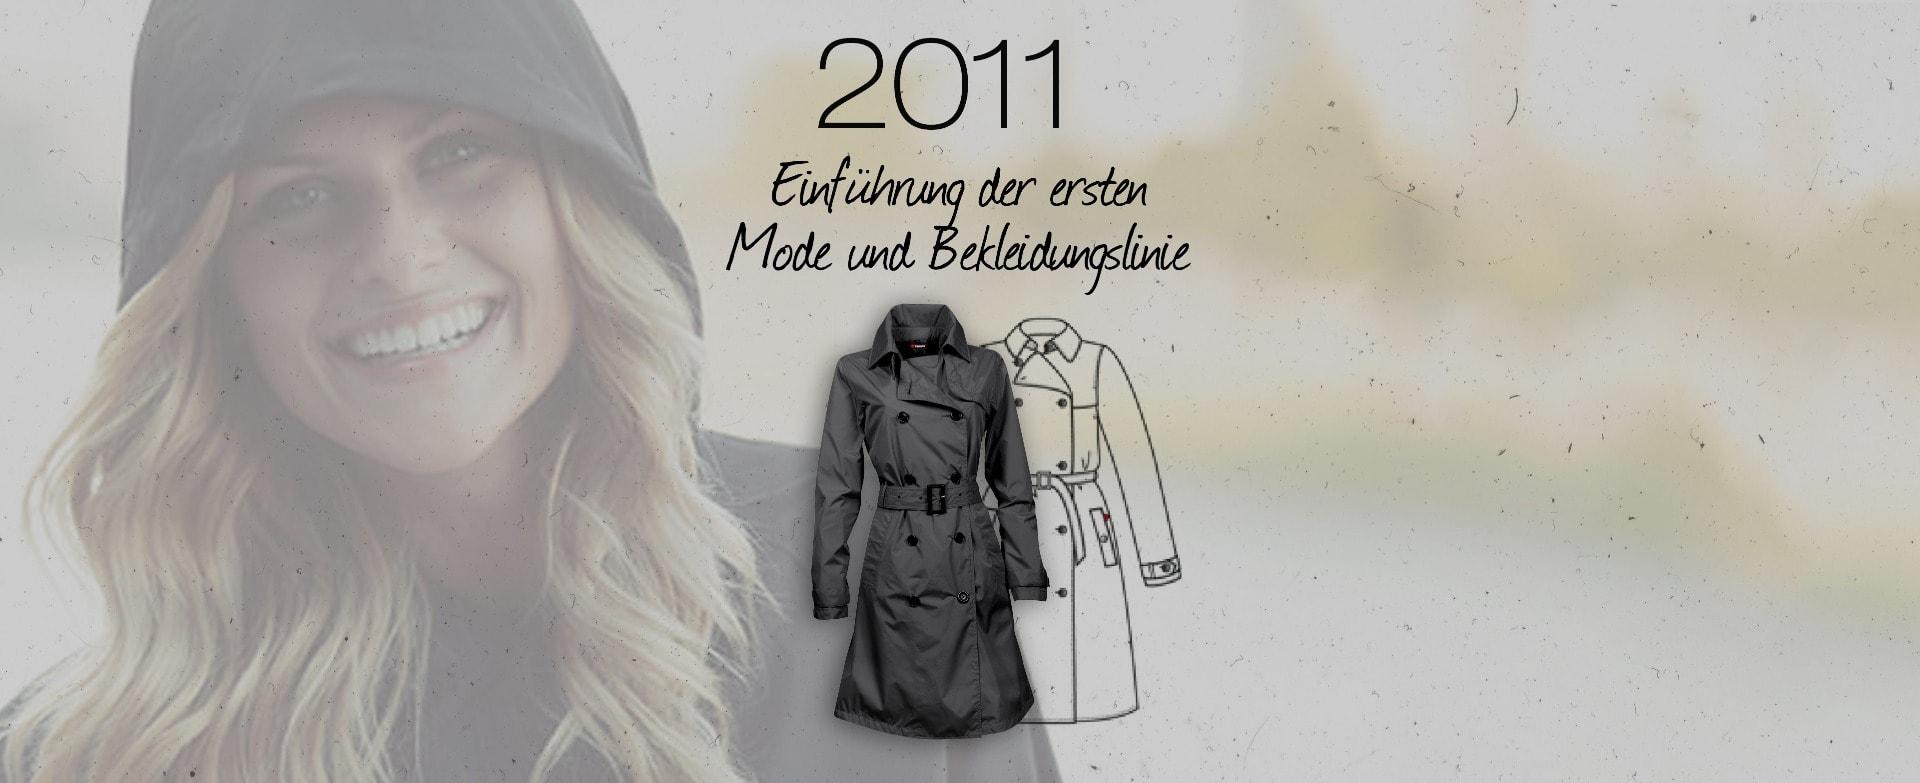 13_2011_regenbekleidung-knirps